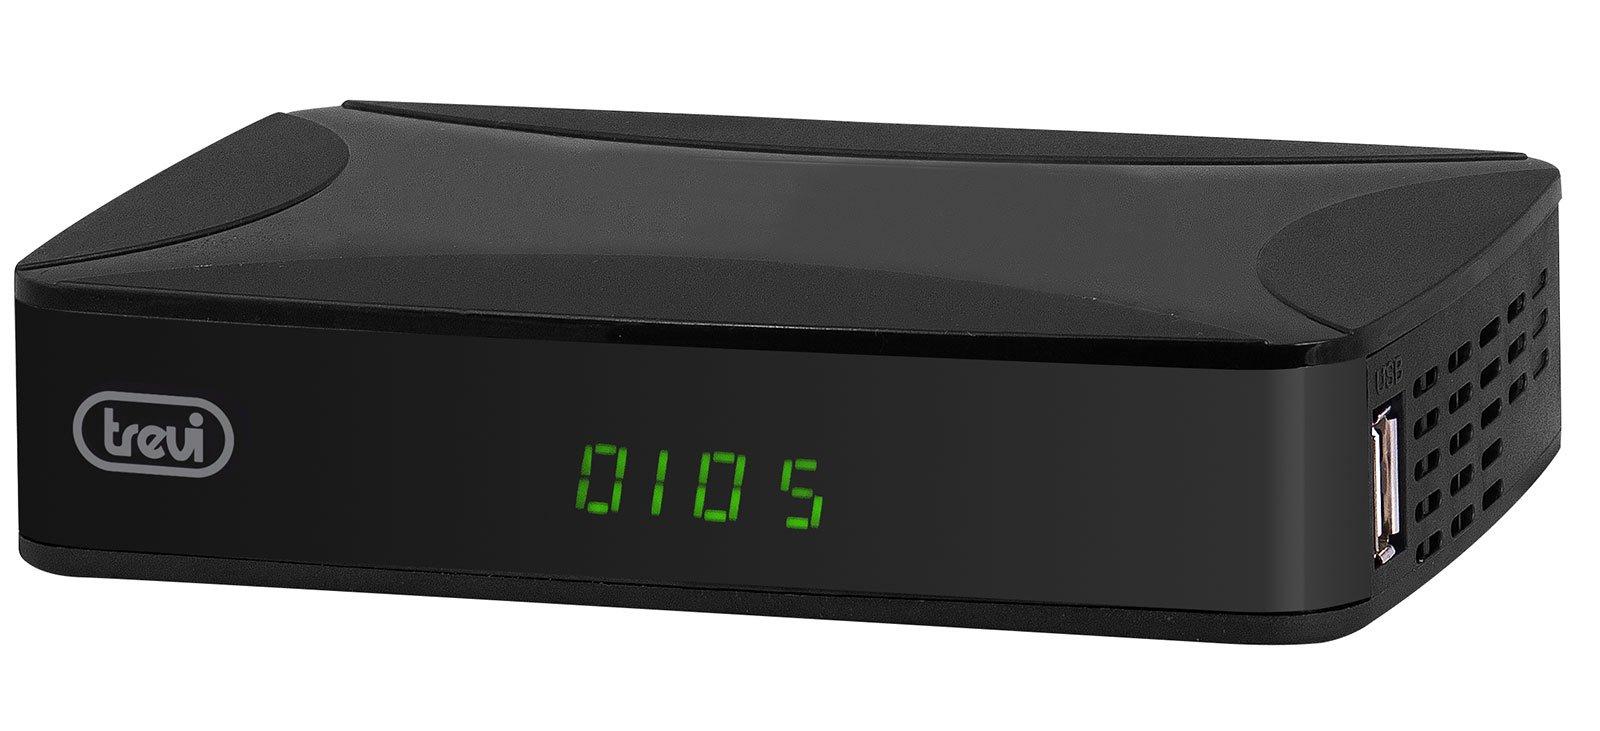 Decoder Digitale Terrestre DVB-T2 HEVC Trevi HE 3368 T2